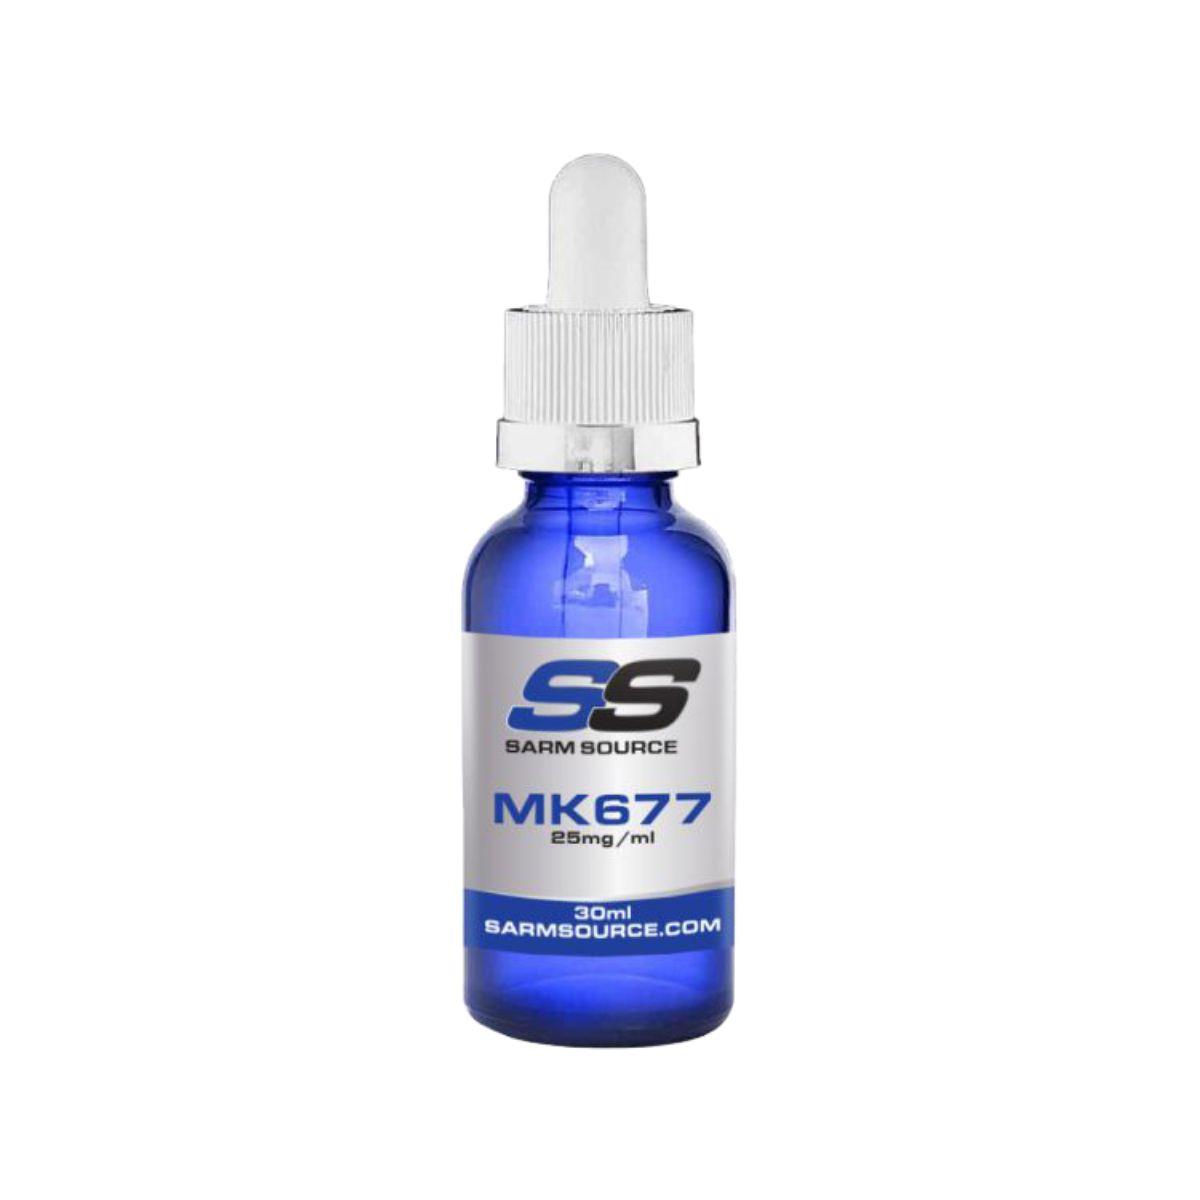 Sarms (MK677) Ibutamoren Liquido 25mg 30ML - Sarm Source